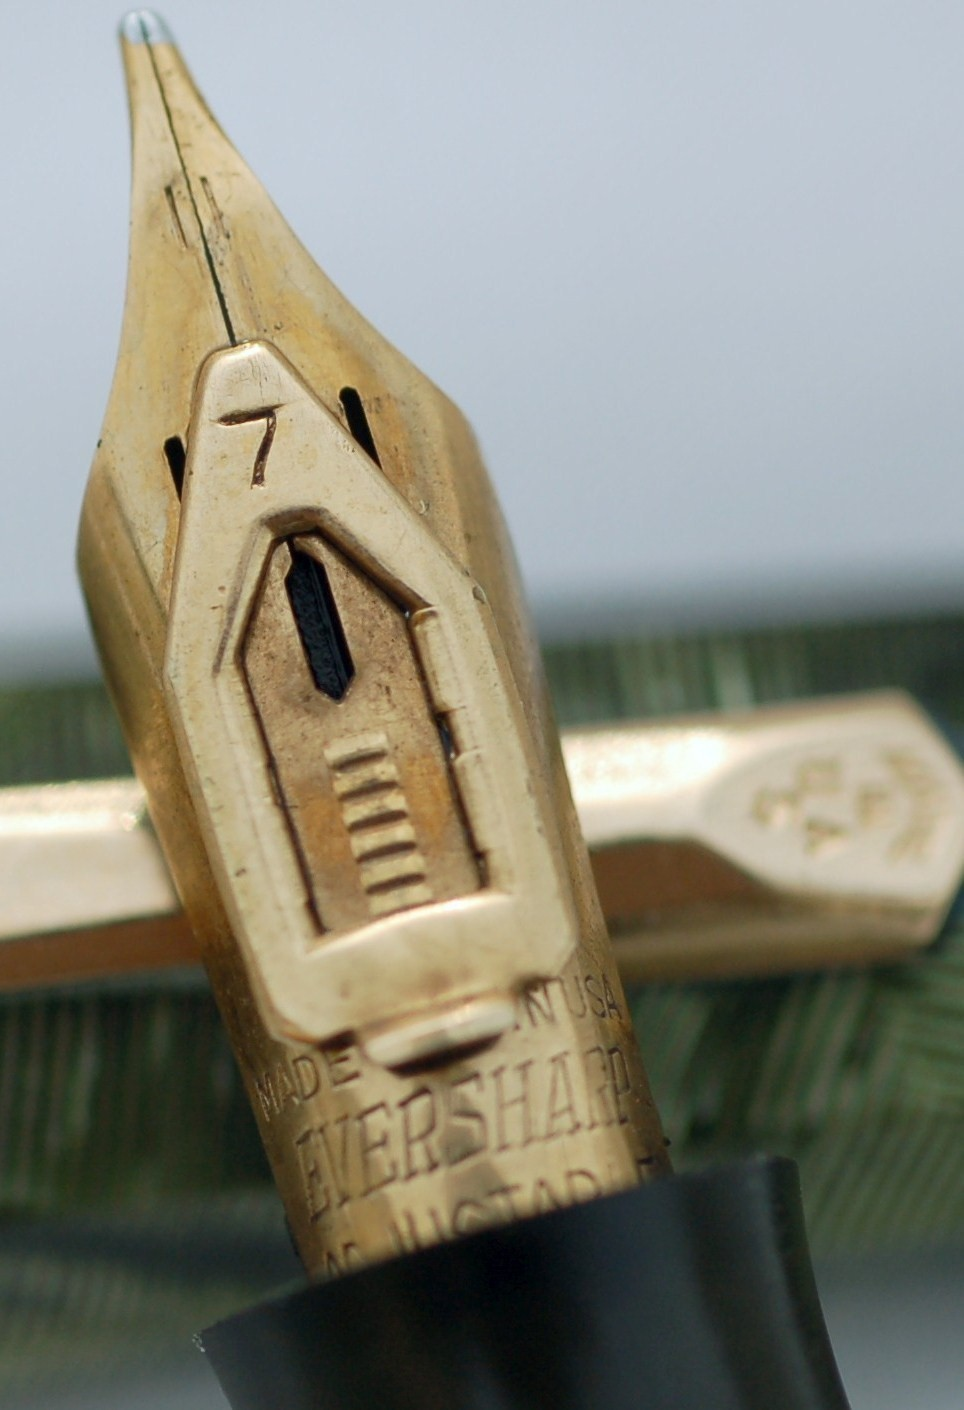 Wahl Doric Fountain Pen #7 Adjustable Nib Close up View